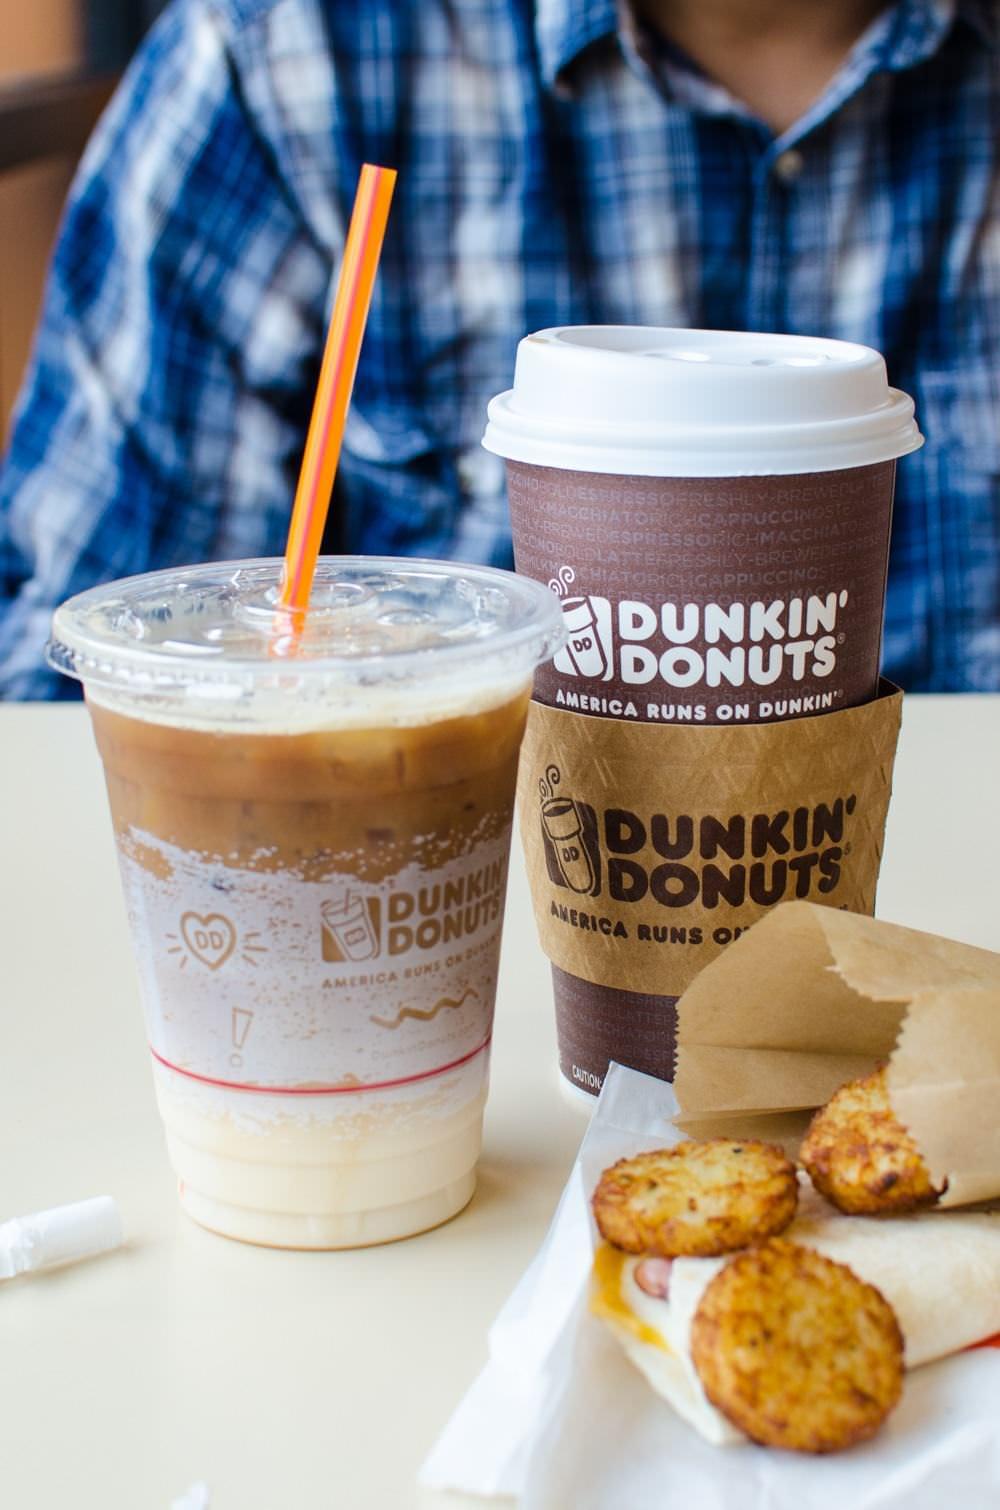 Dunkin' Donuts Salted Caramel Macchiato - The Flavor Bender